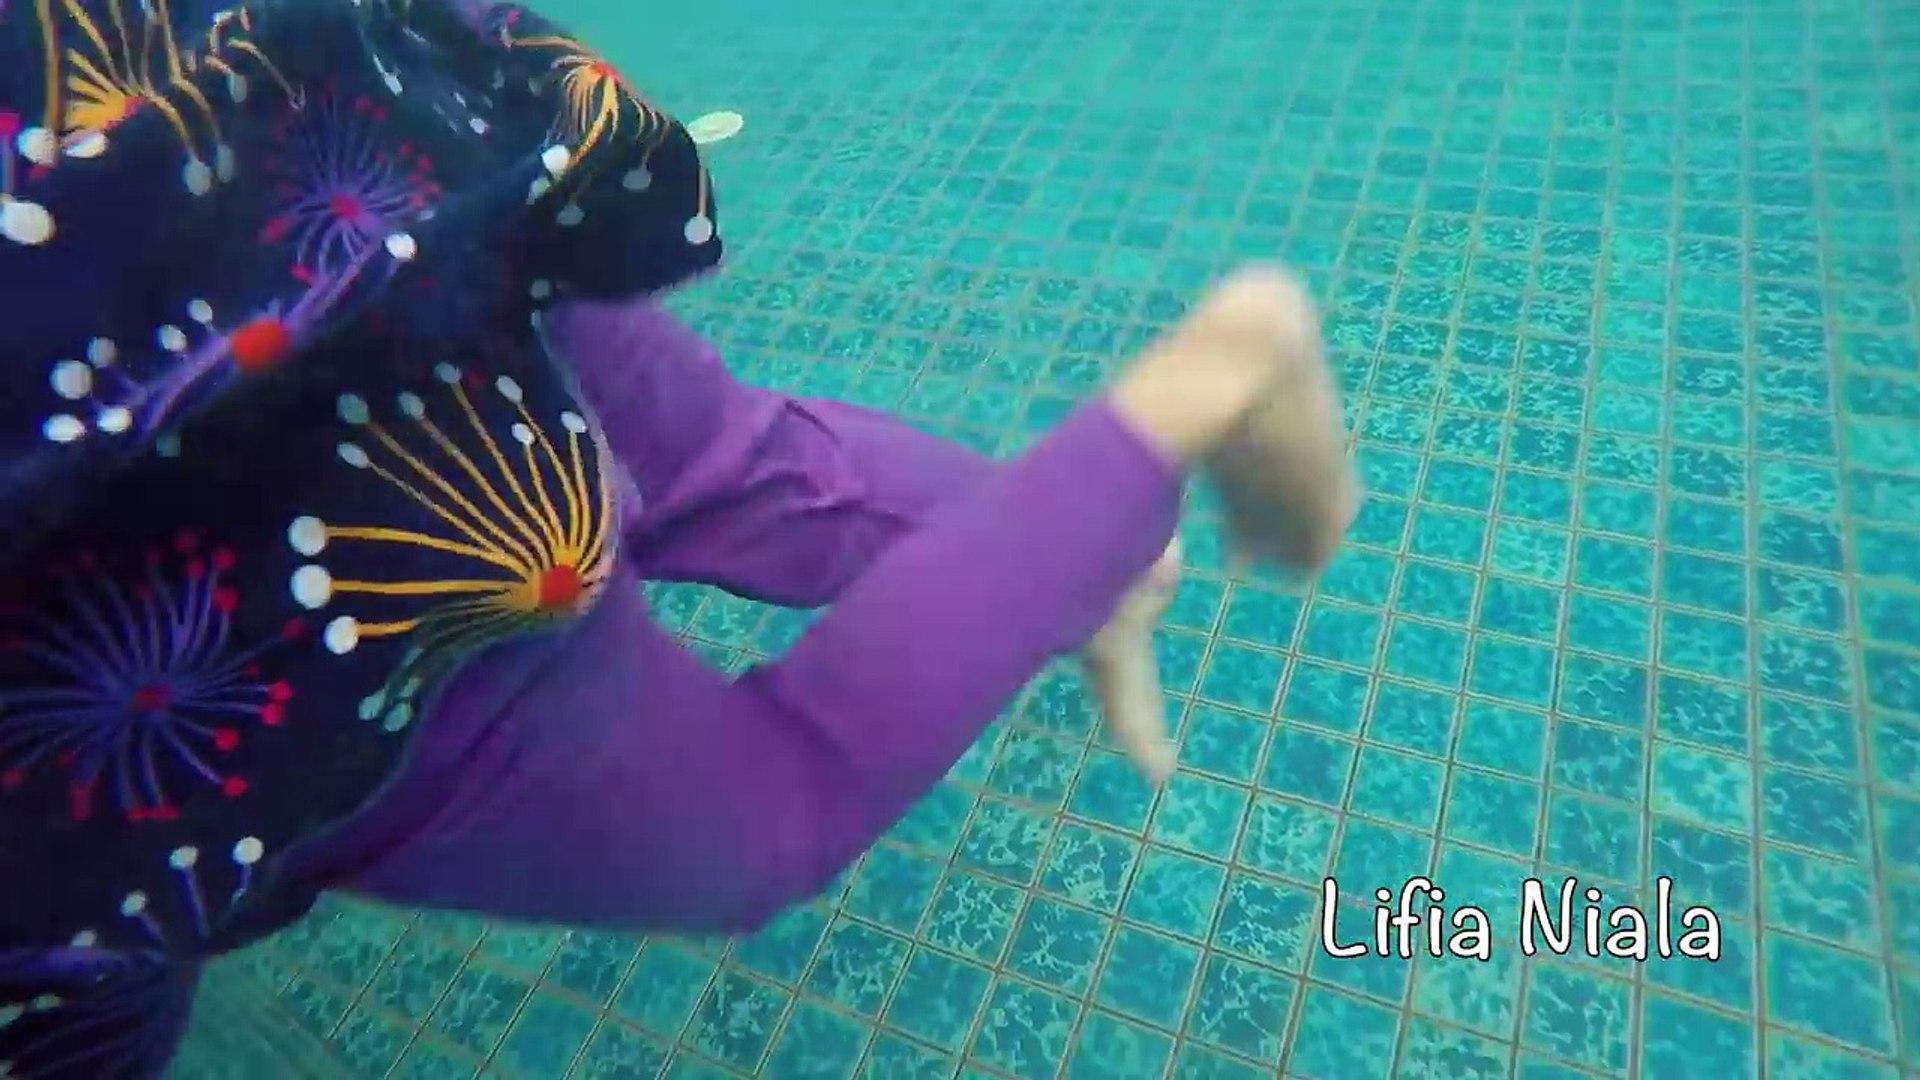 Fun swim together ❤ Happy Swimmer Kids Life Vest Swimming Pool Toy Set - Kids Toys @LifiaT